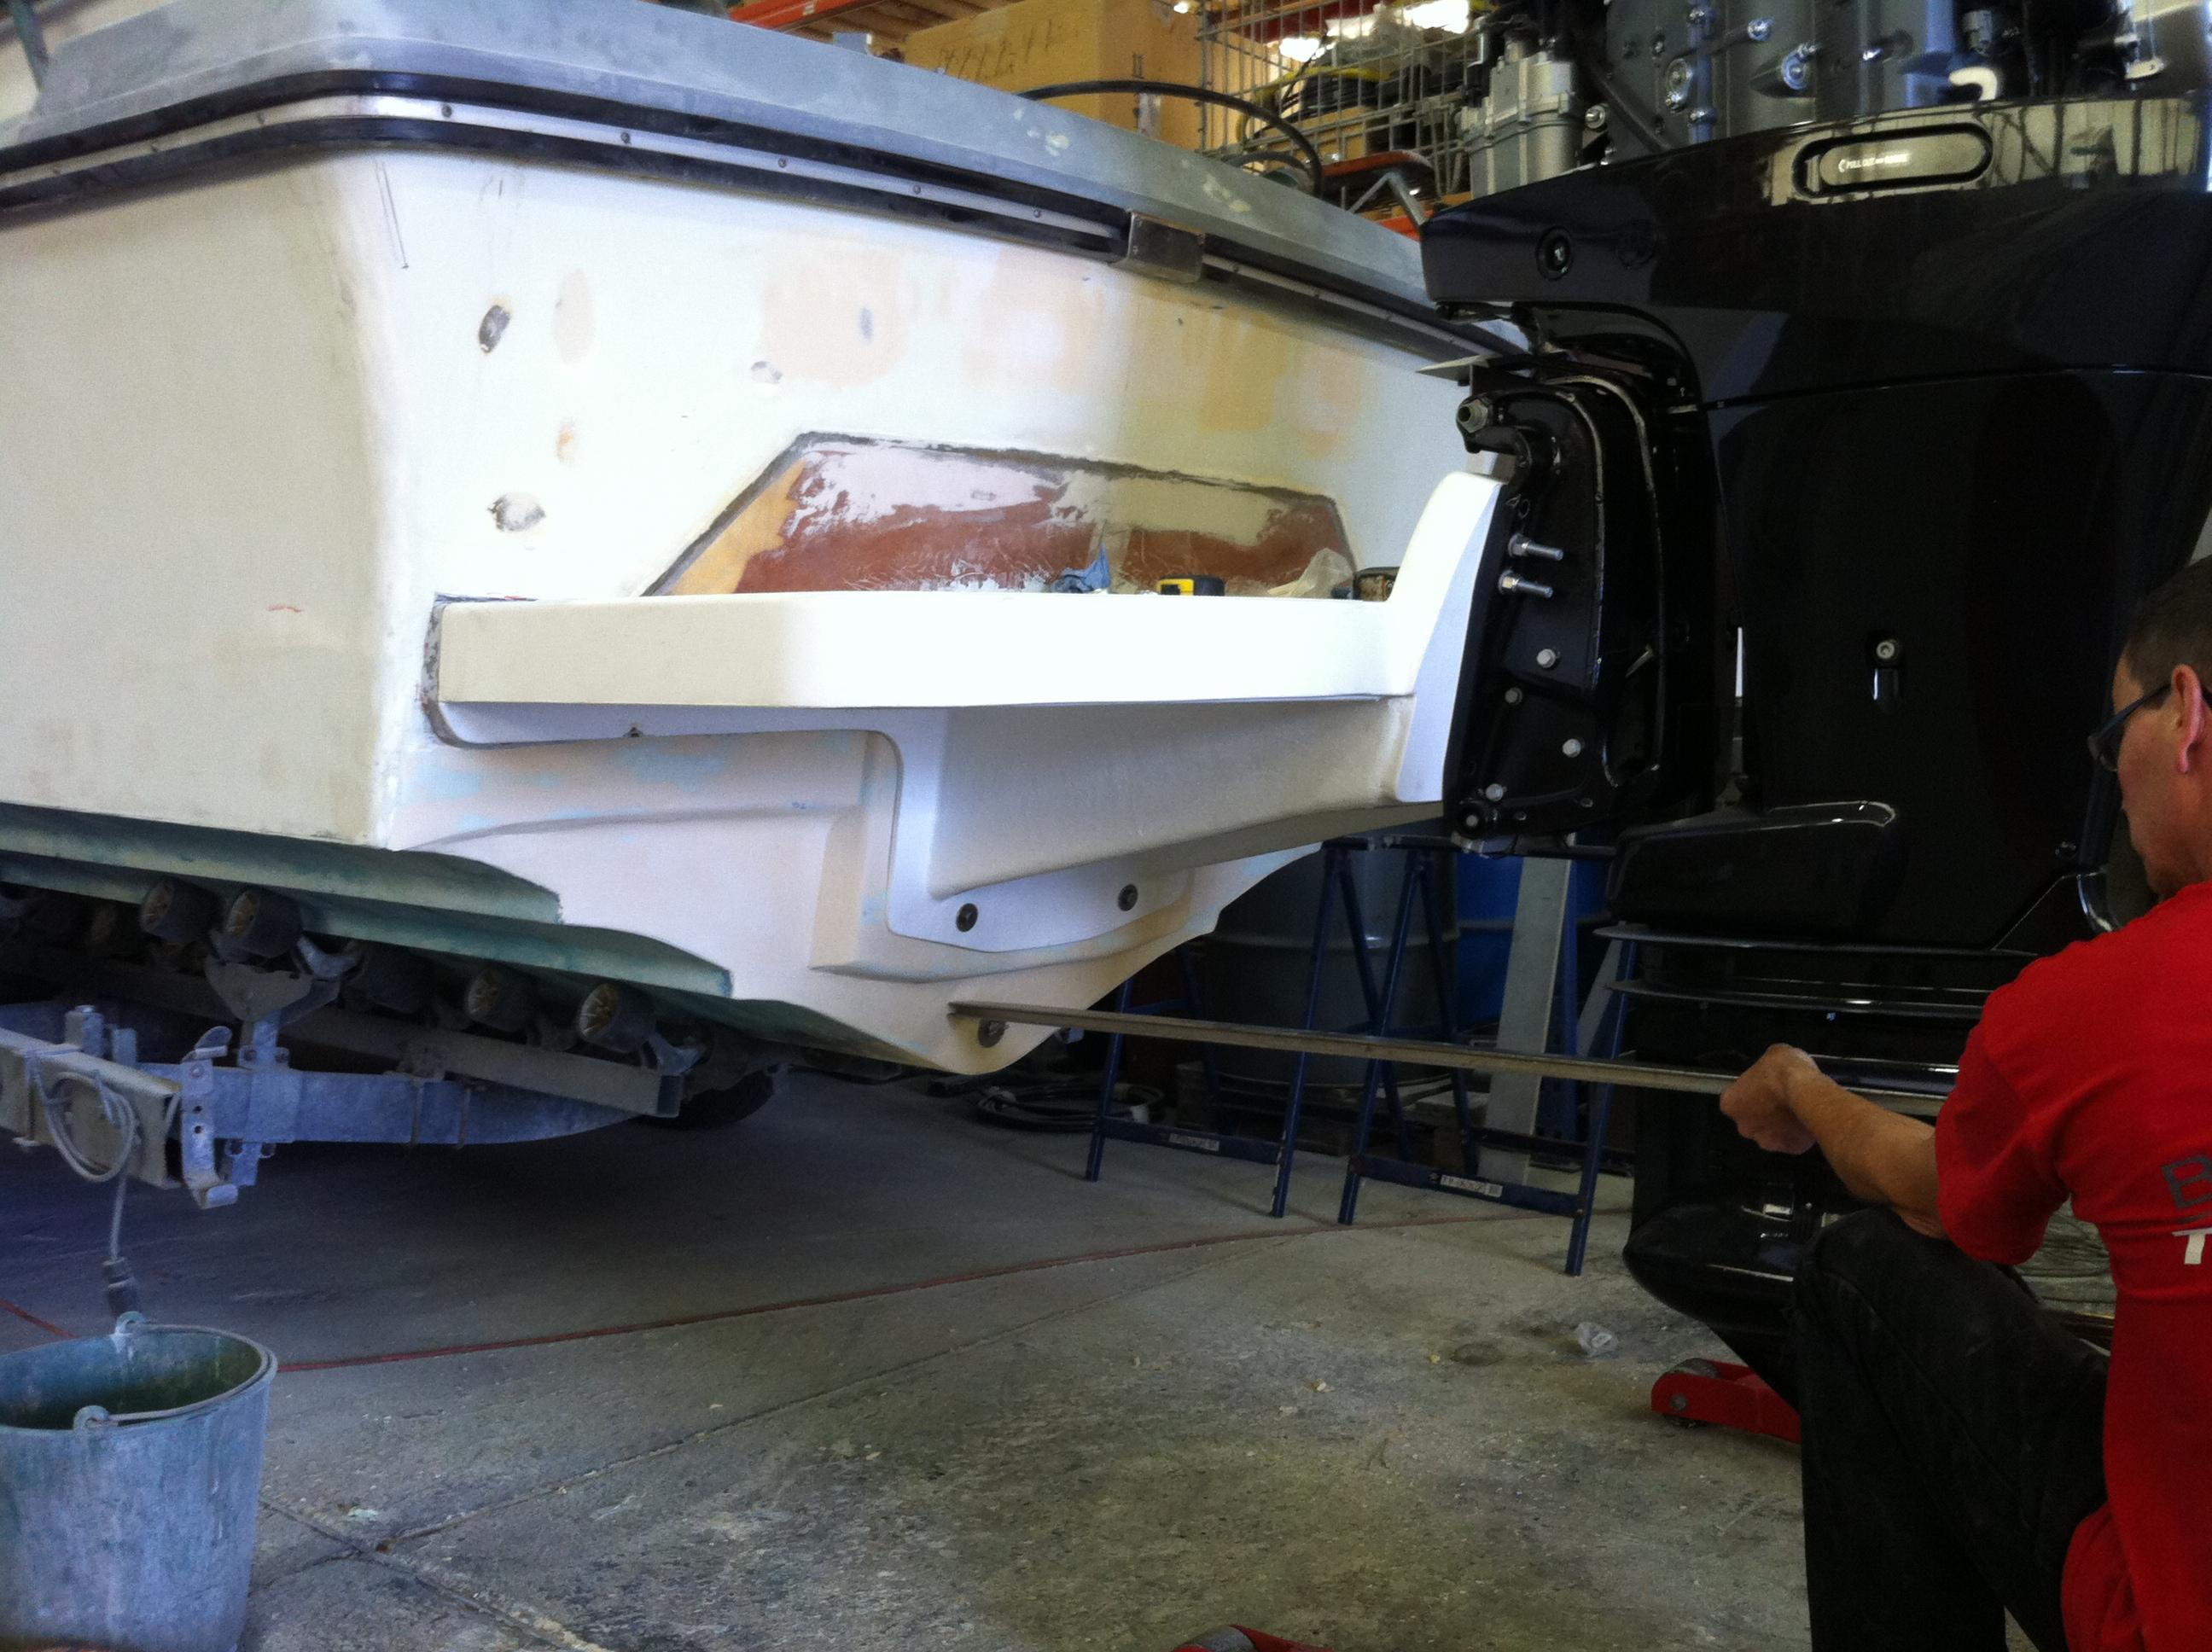 restauration d u0026 39  un bateau  u00e0 moteur windy 22